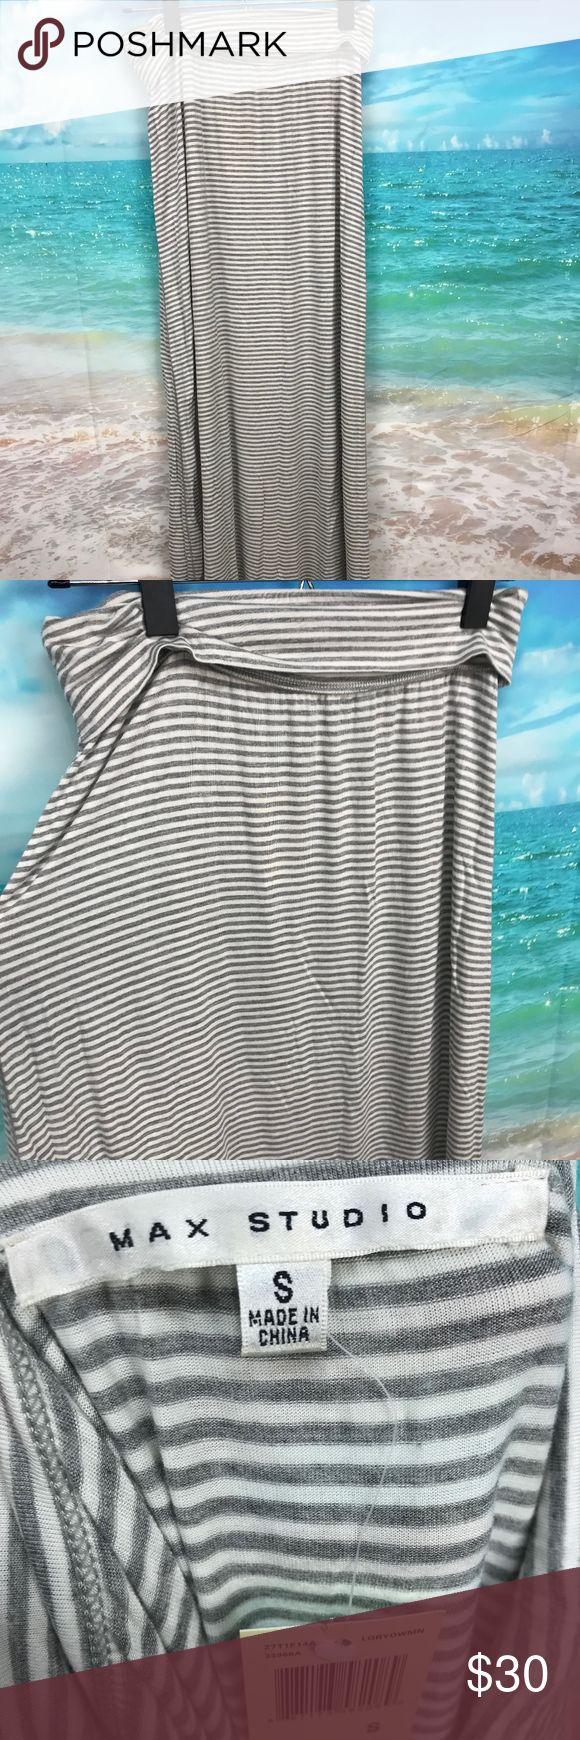 "Max Studio Gray White Striped Maxi Skirt Small Max Studio Gray White Striped Maxi Skirt Small Long Modest NEW Stretch #1028 Measurements Laying Flat:  Waist:14"" Length:43"" Max Studio Skirts Maxi"